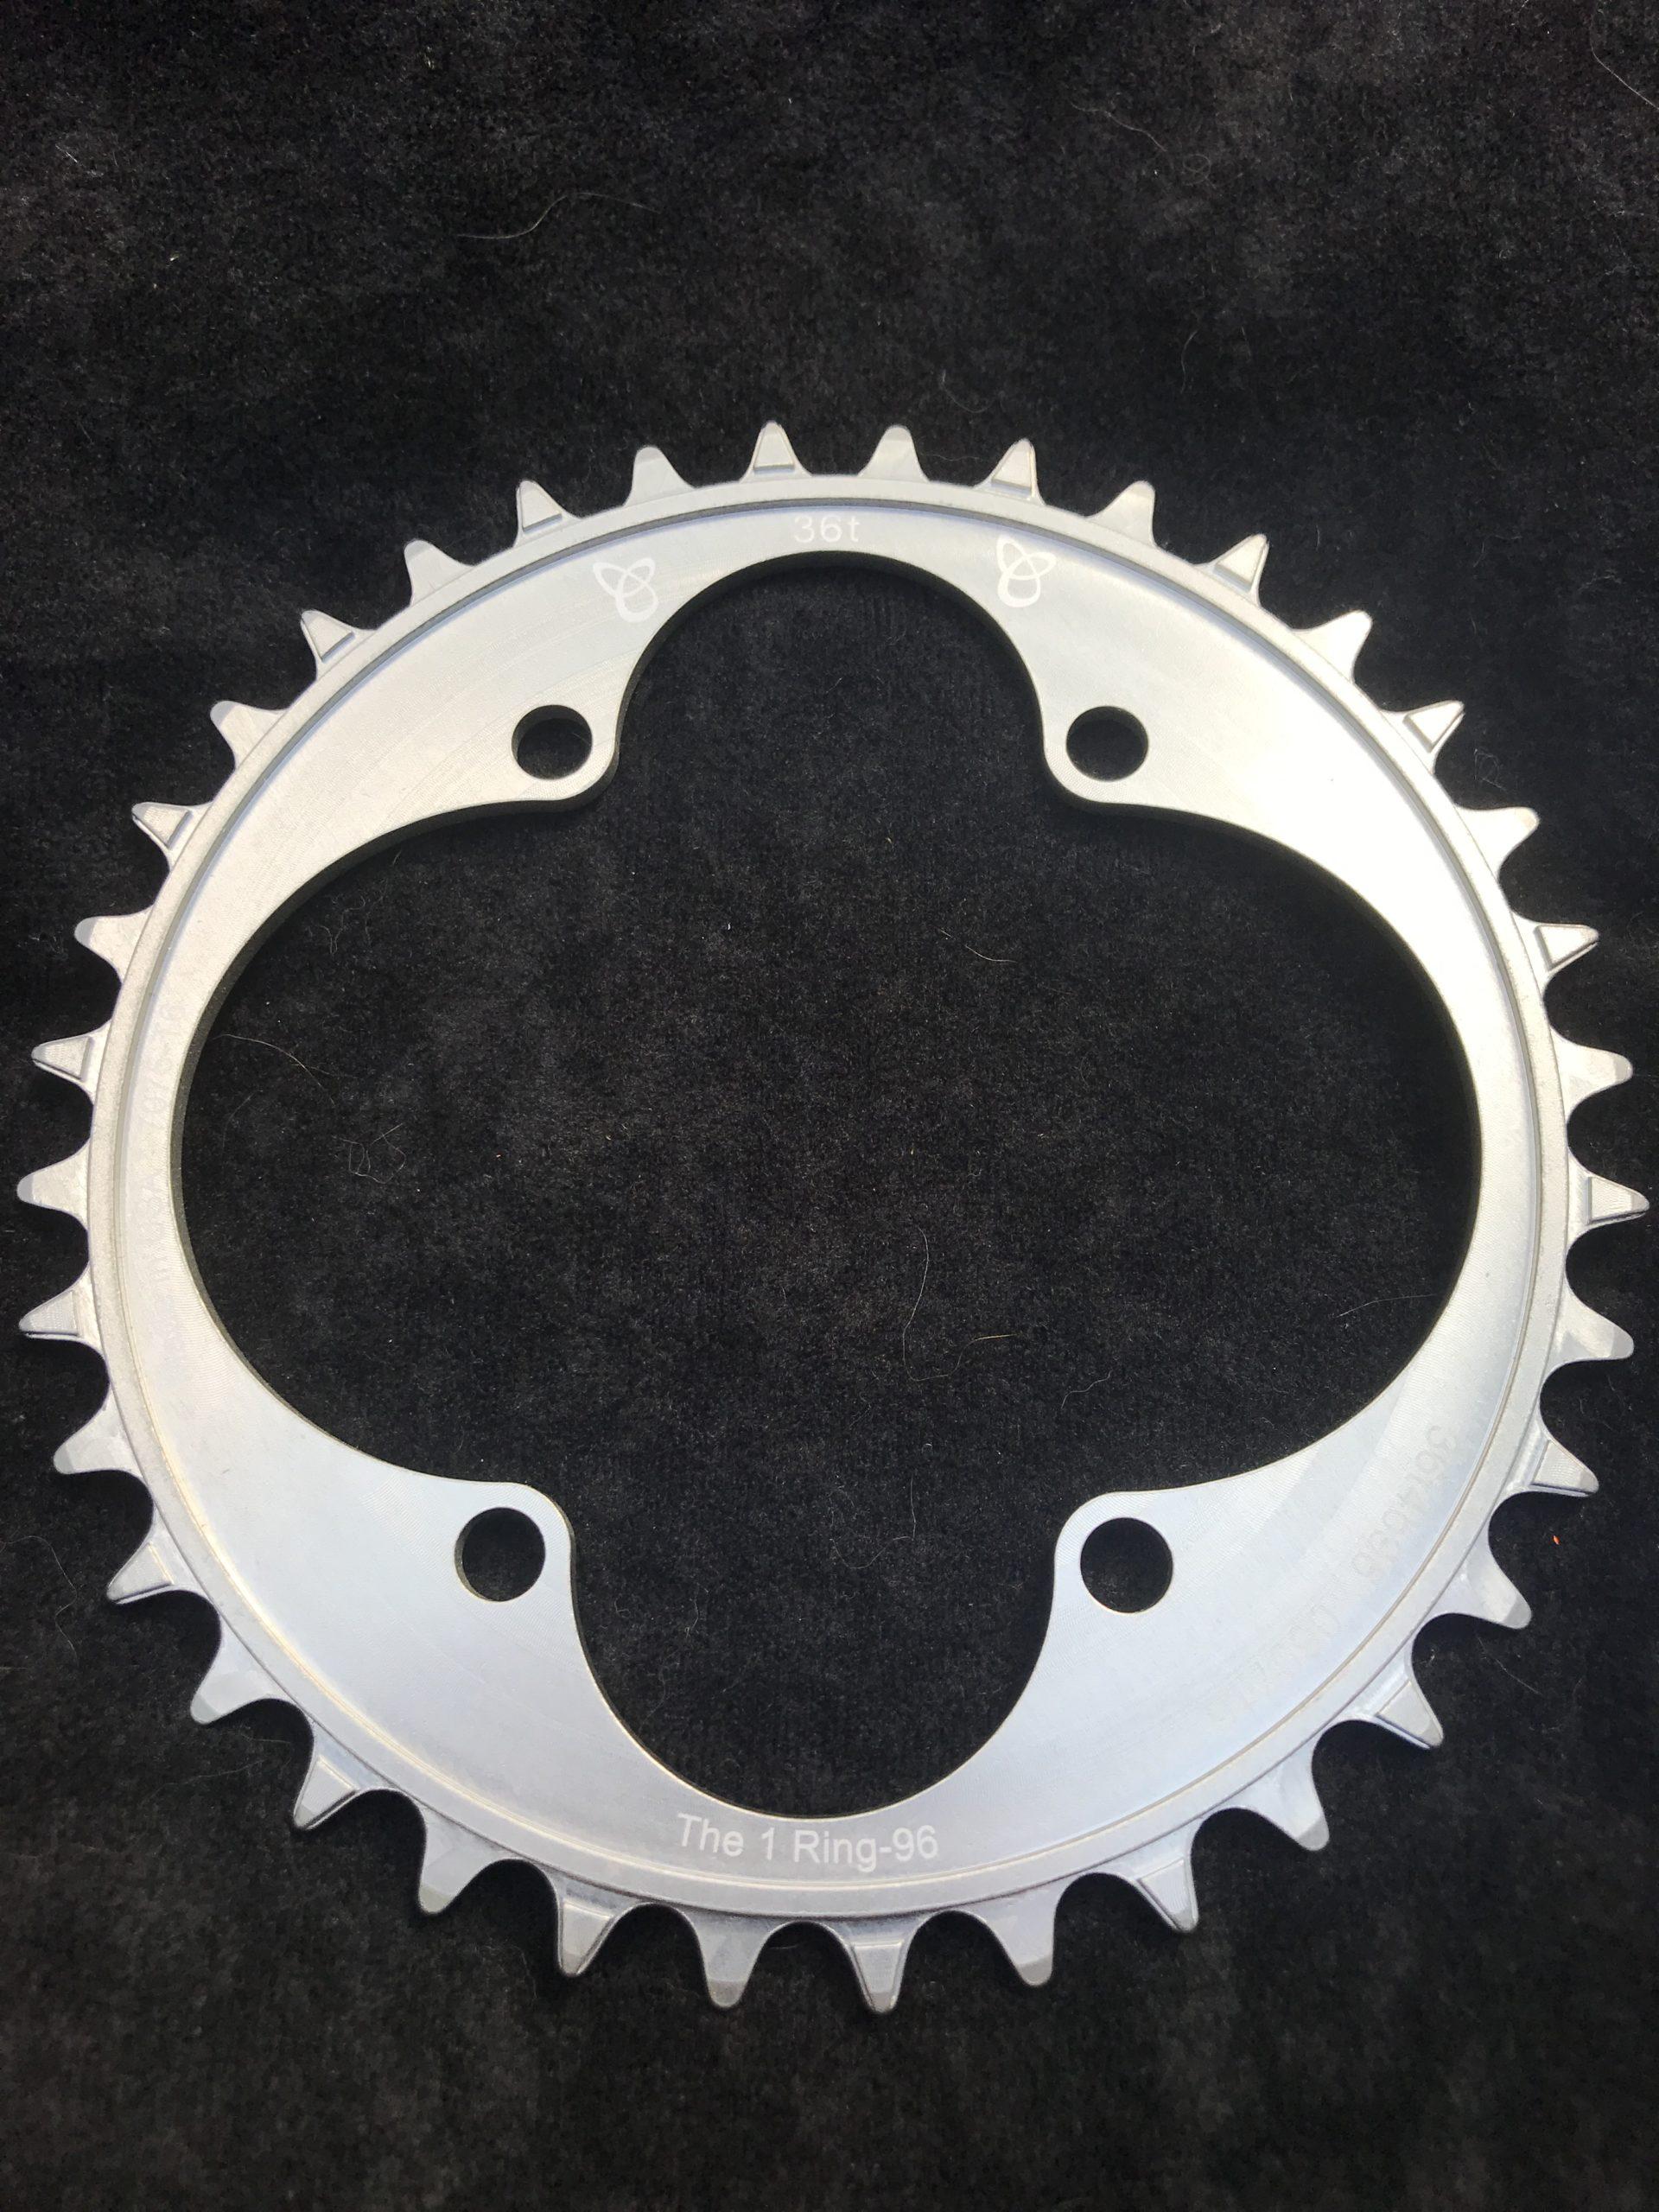 Shimano XT chainring 36t silver